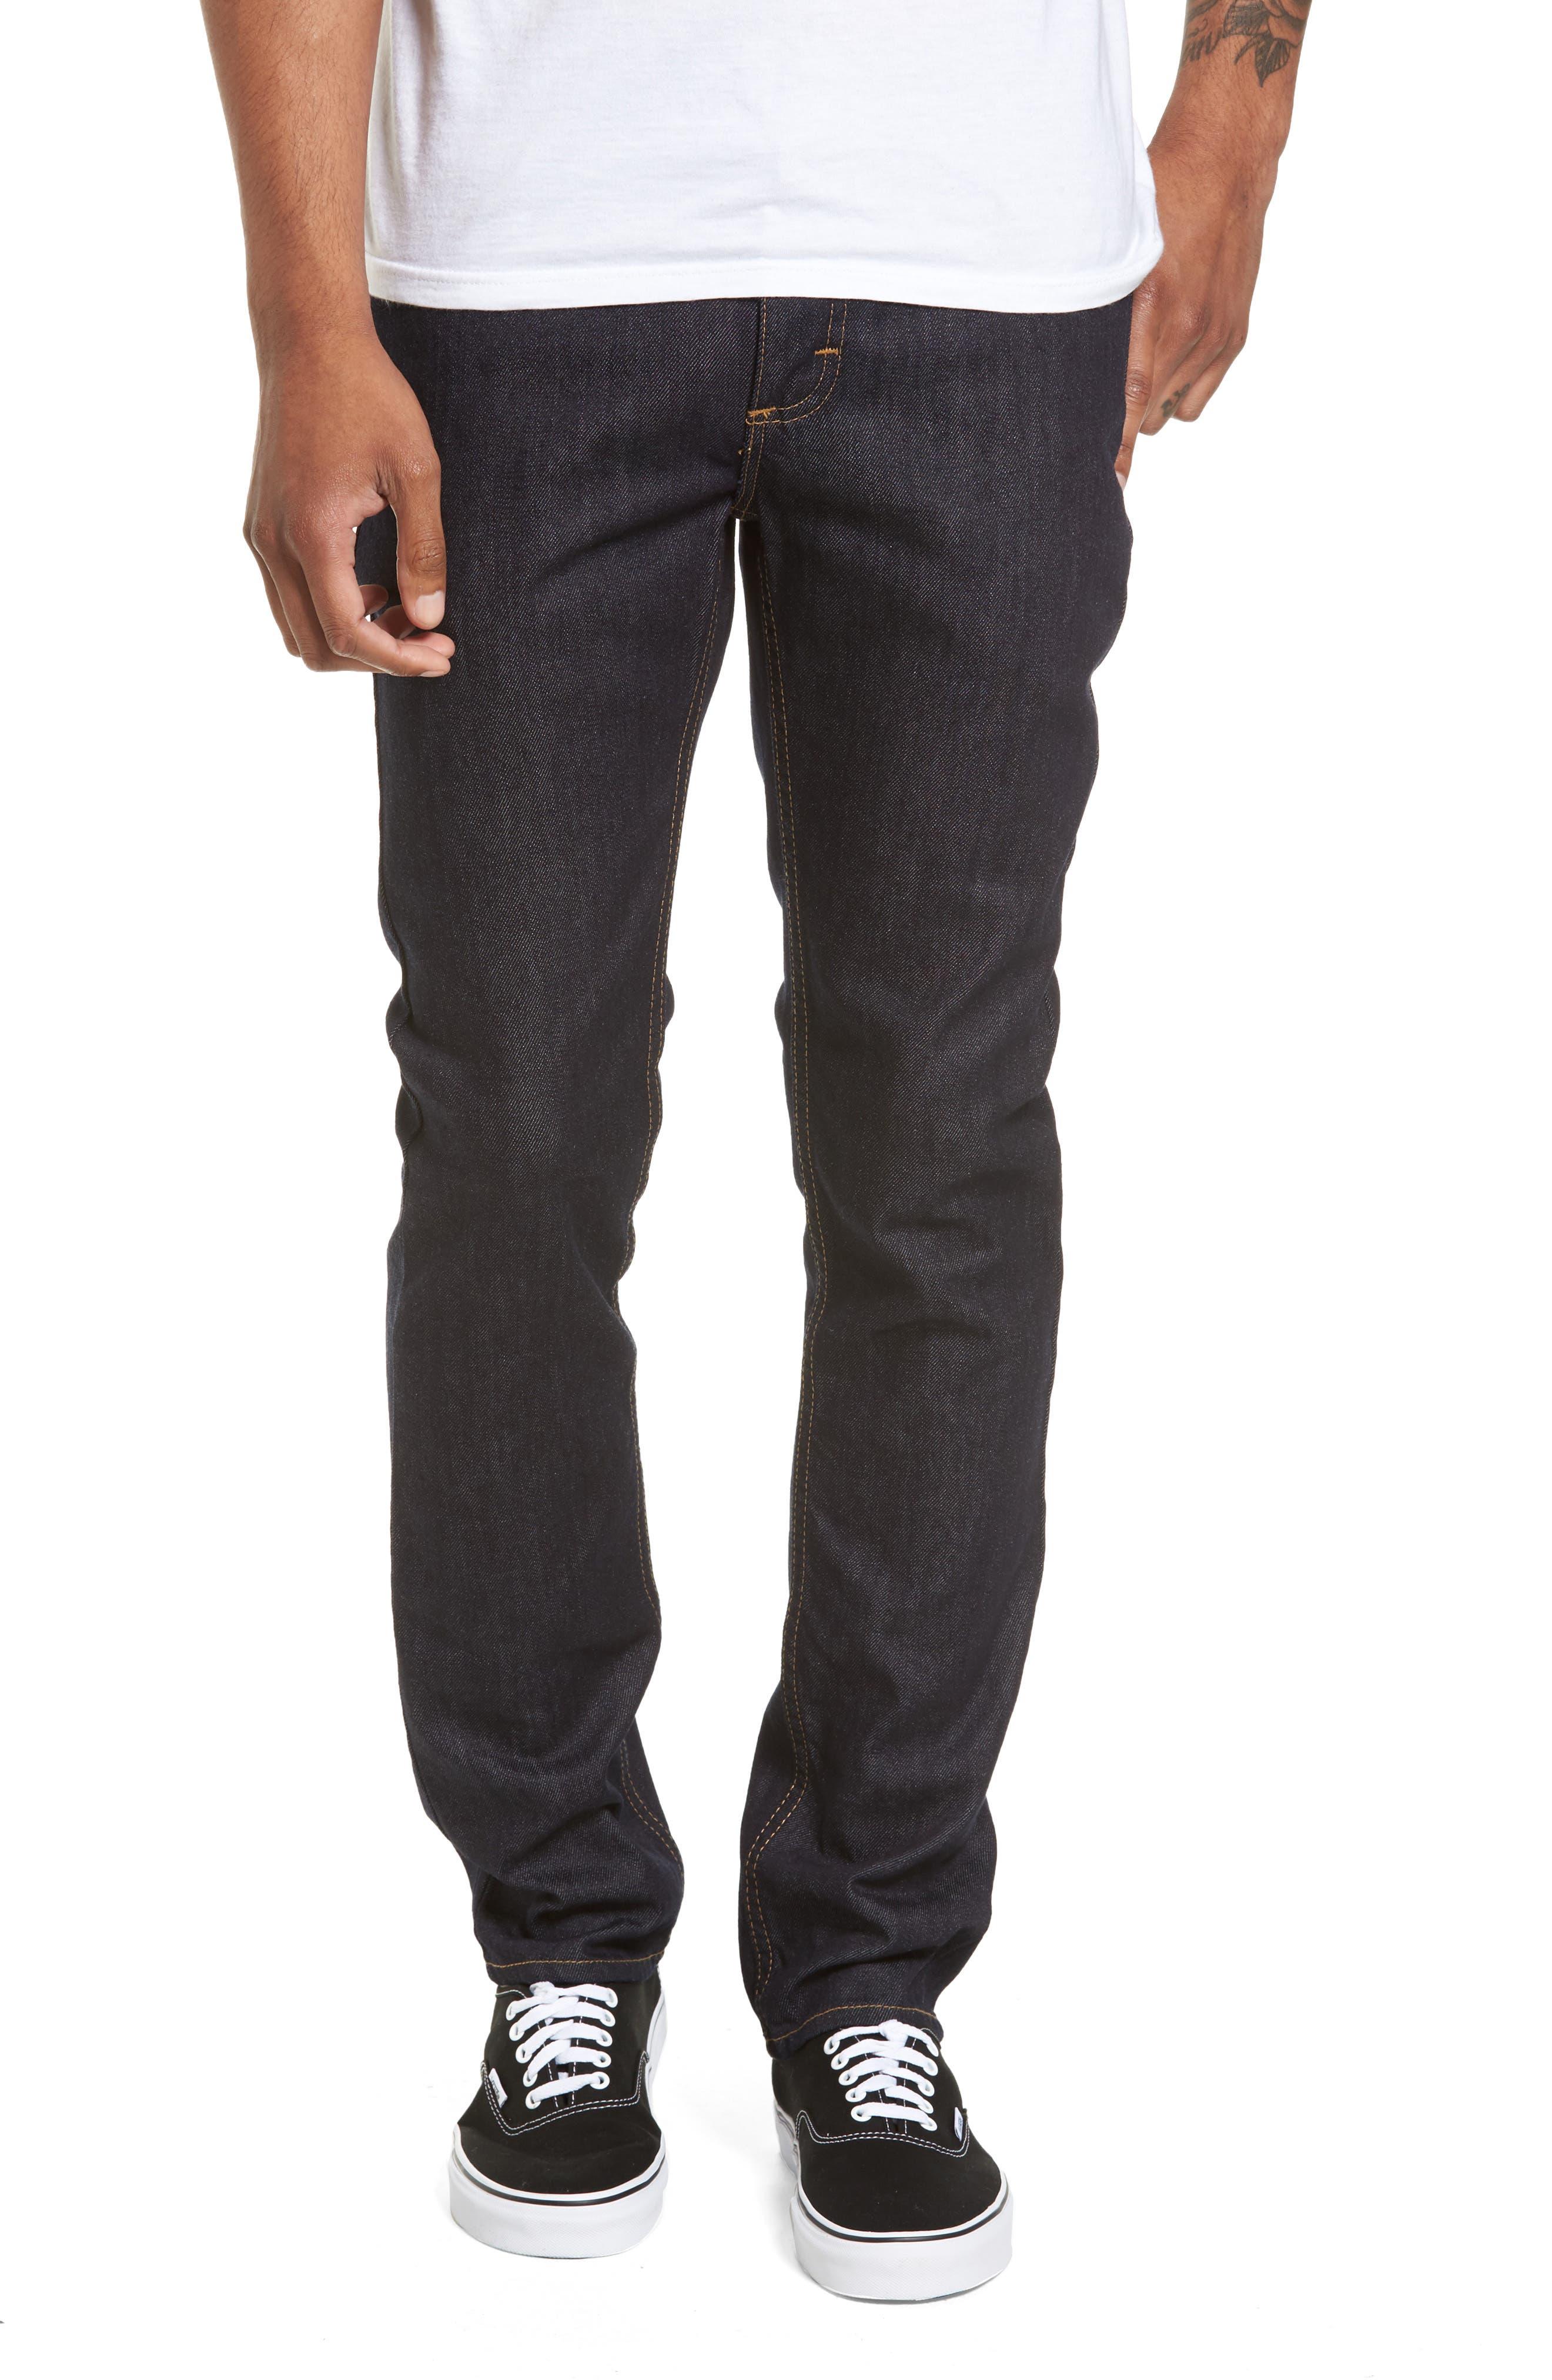 V76 Skinny Jeans,                         Main,                         color, Indigo